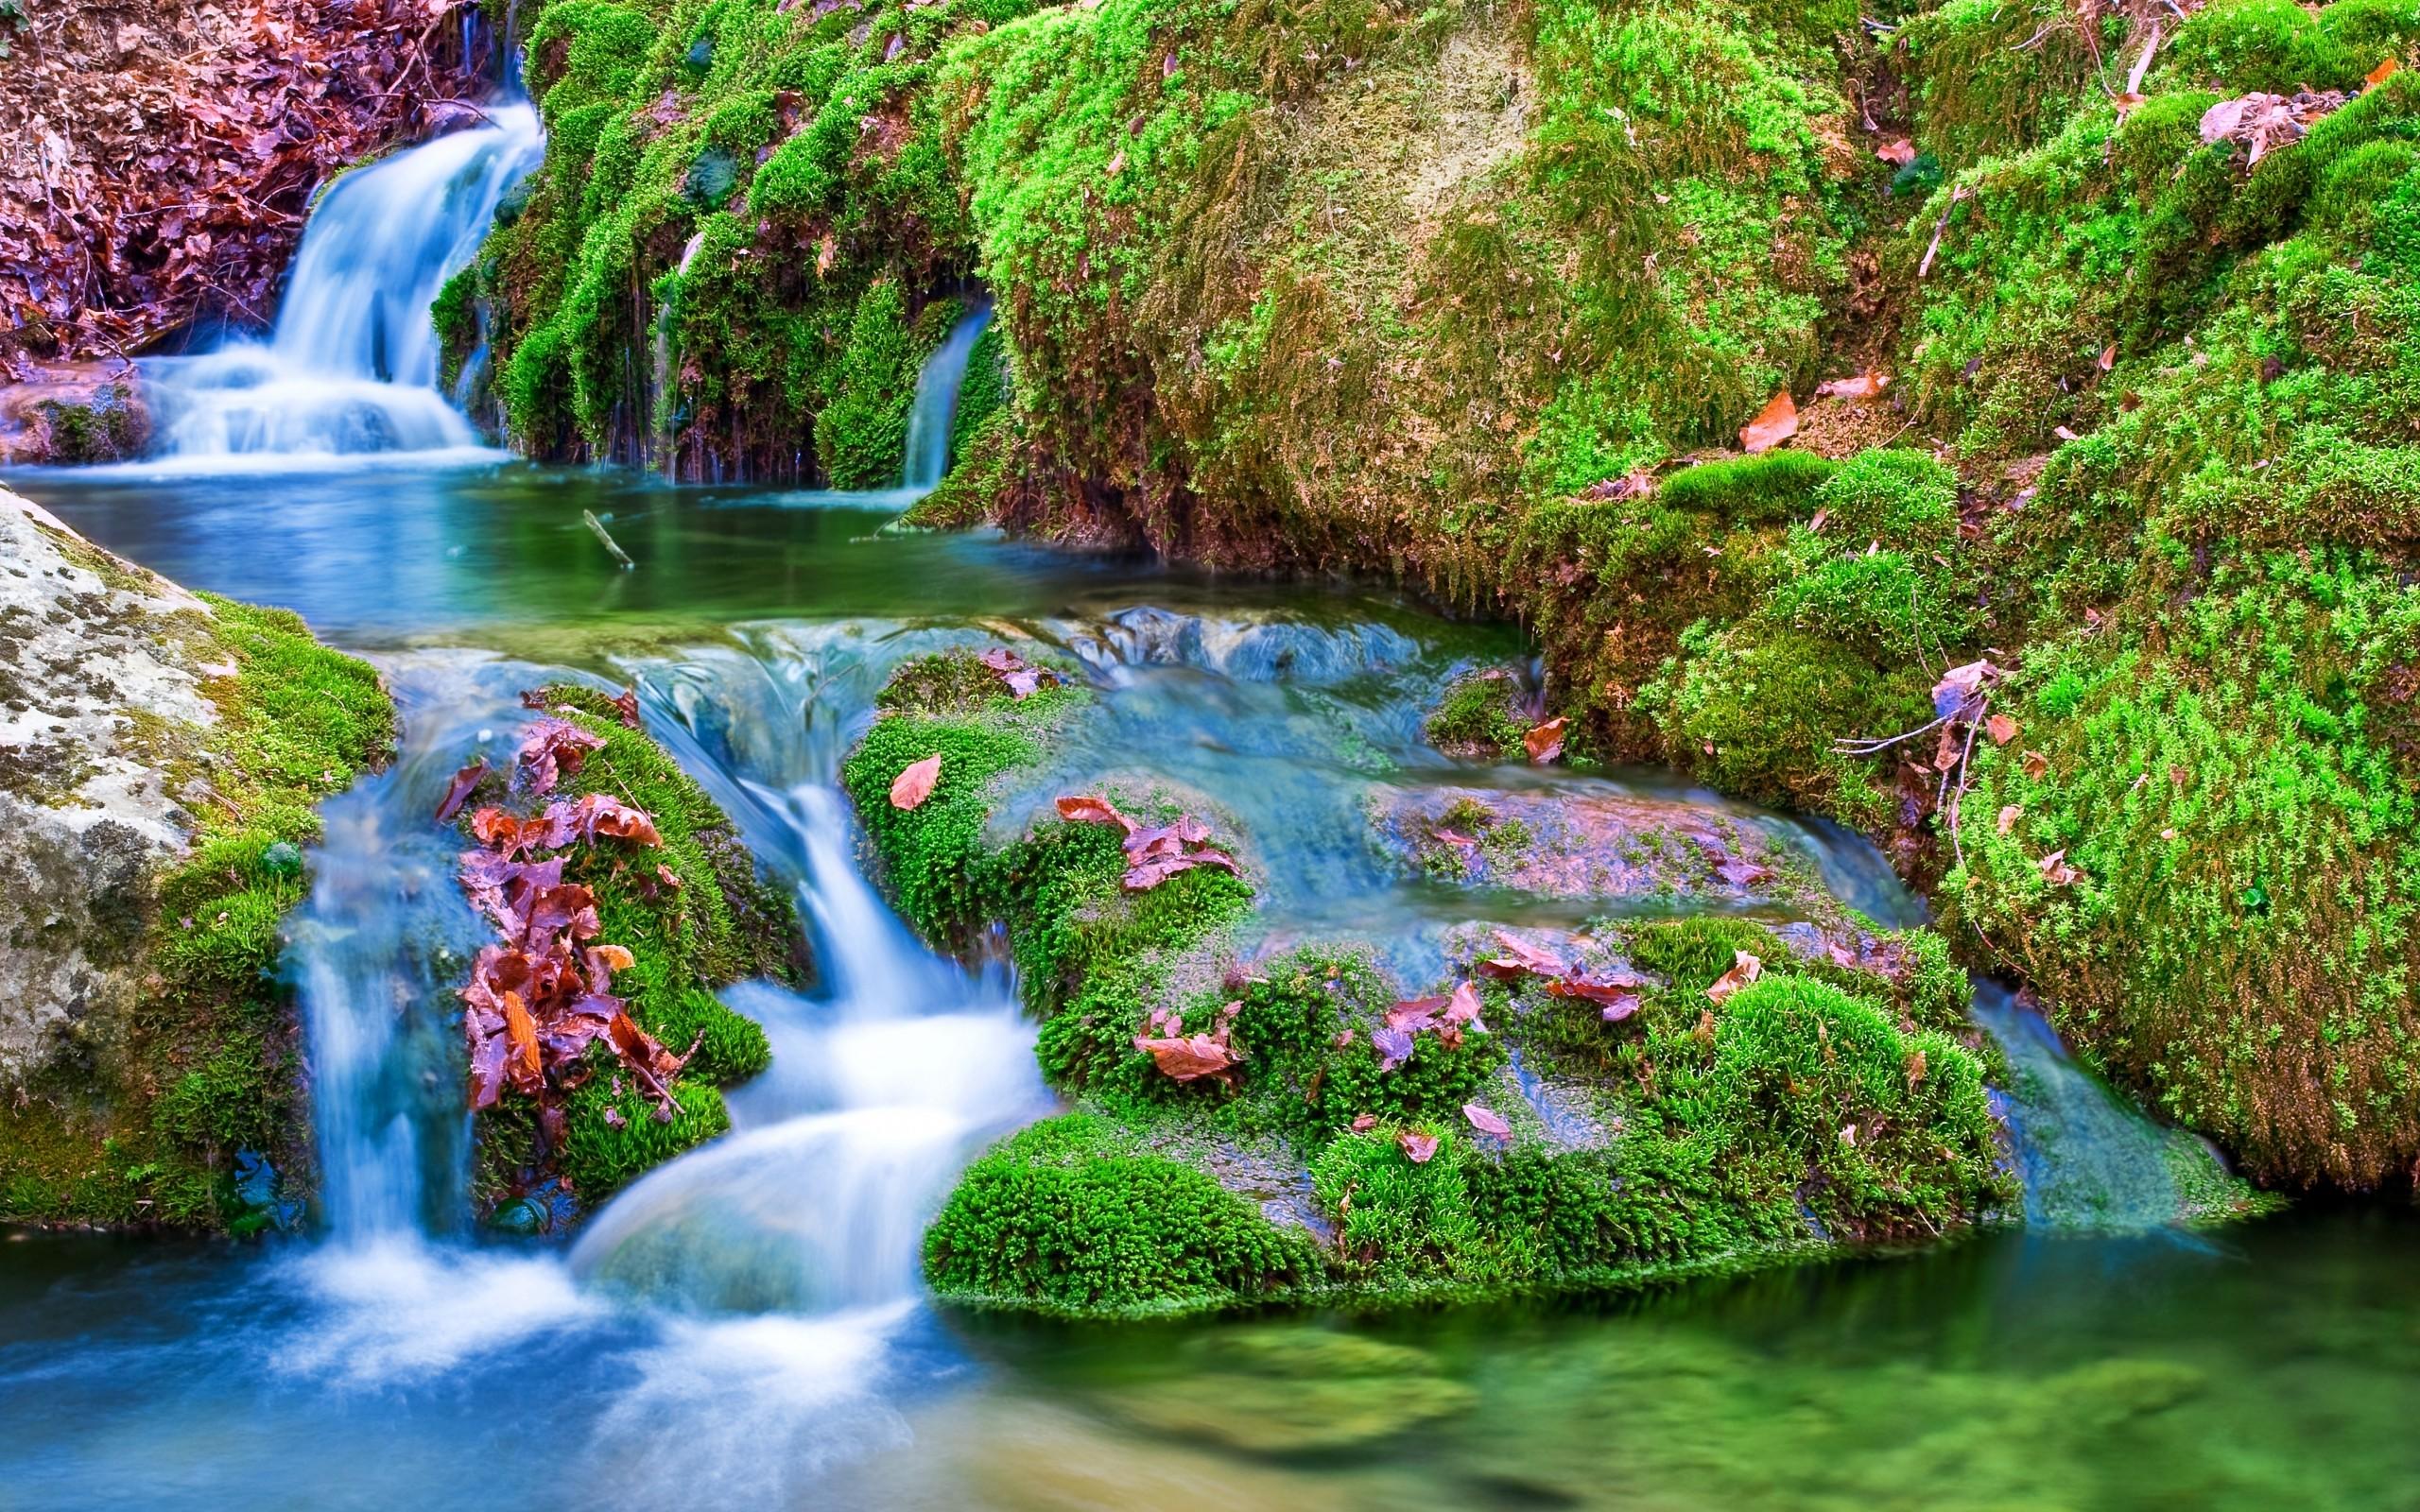 Travel Background Hd Wallpapers Free Niagra Falls Hd Wallpaper Waterfall Download Pixelstalk Net